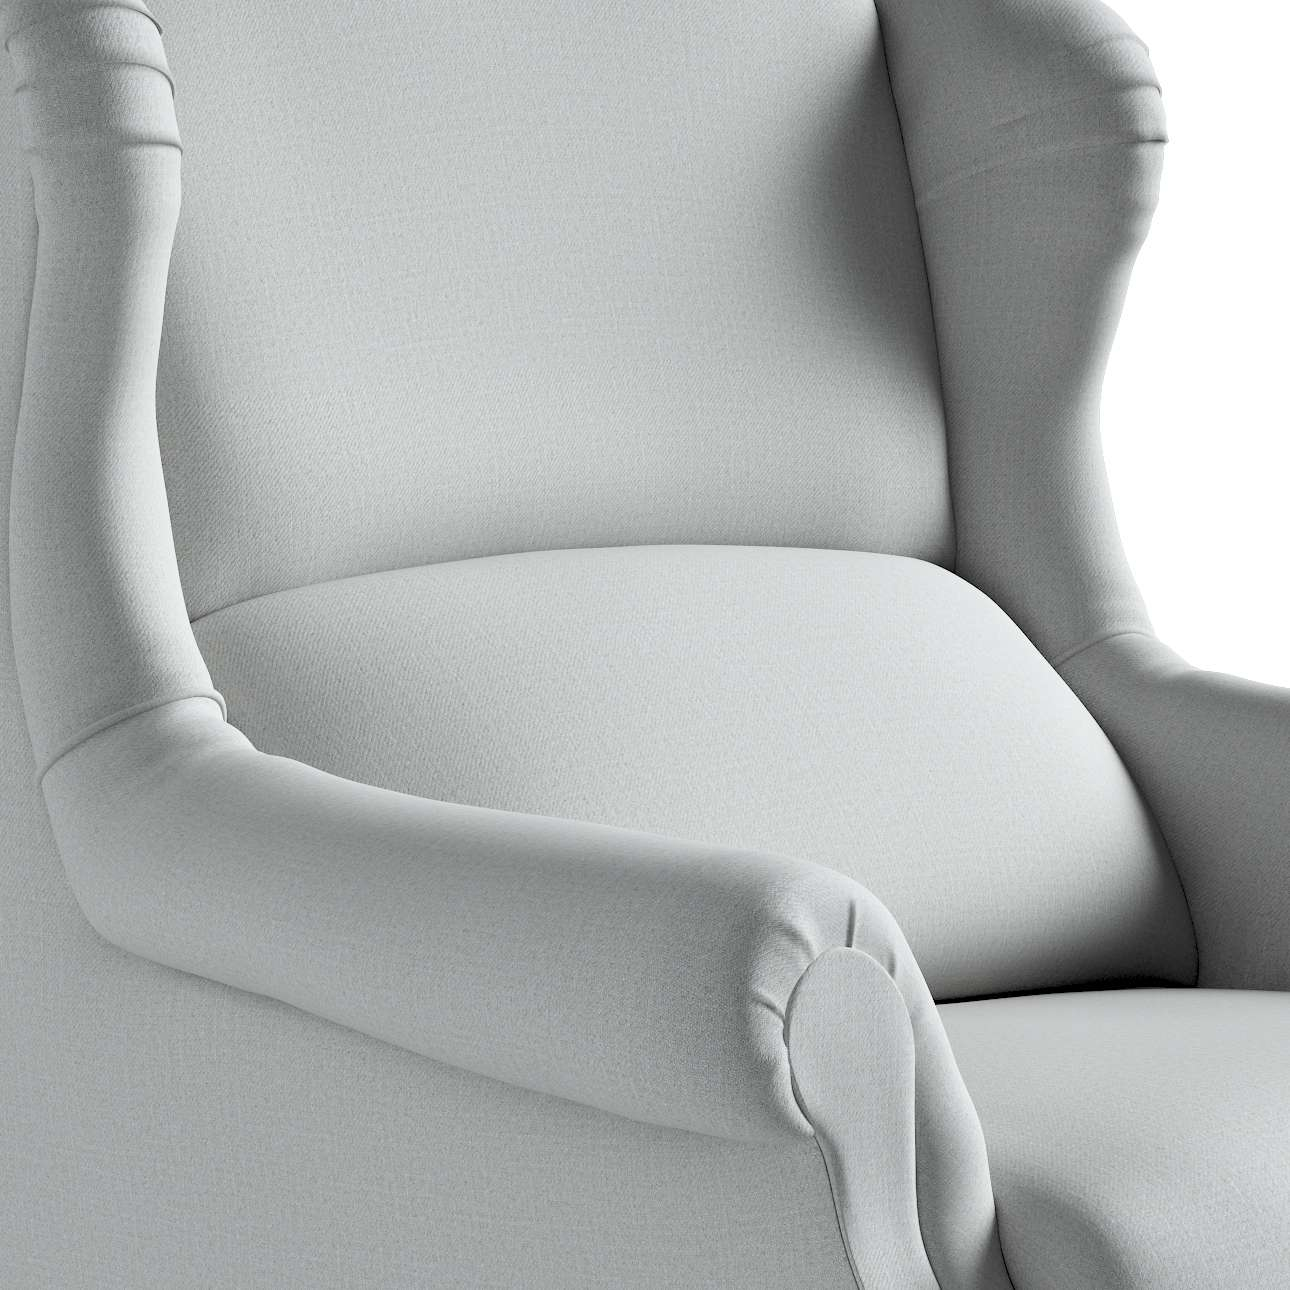 Fotel Unique w kolekcji Living, tkanina: 161-18